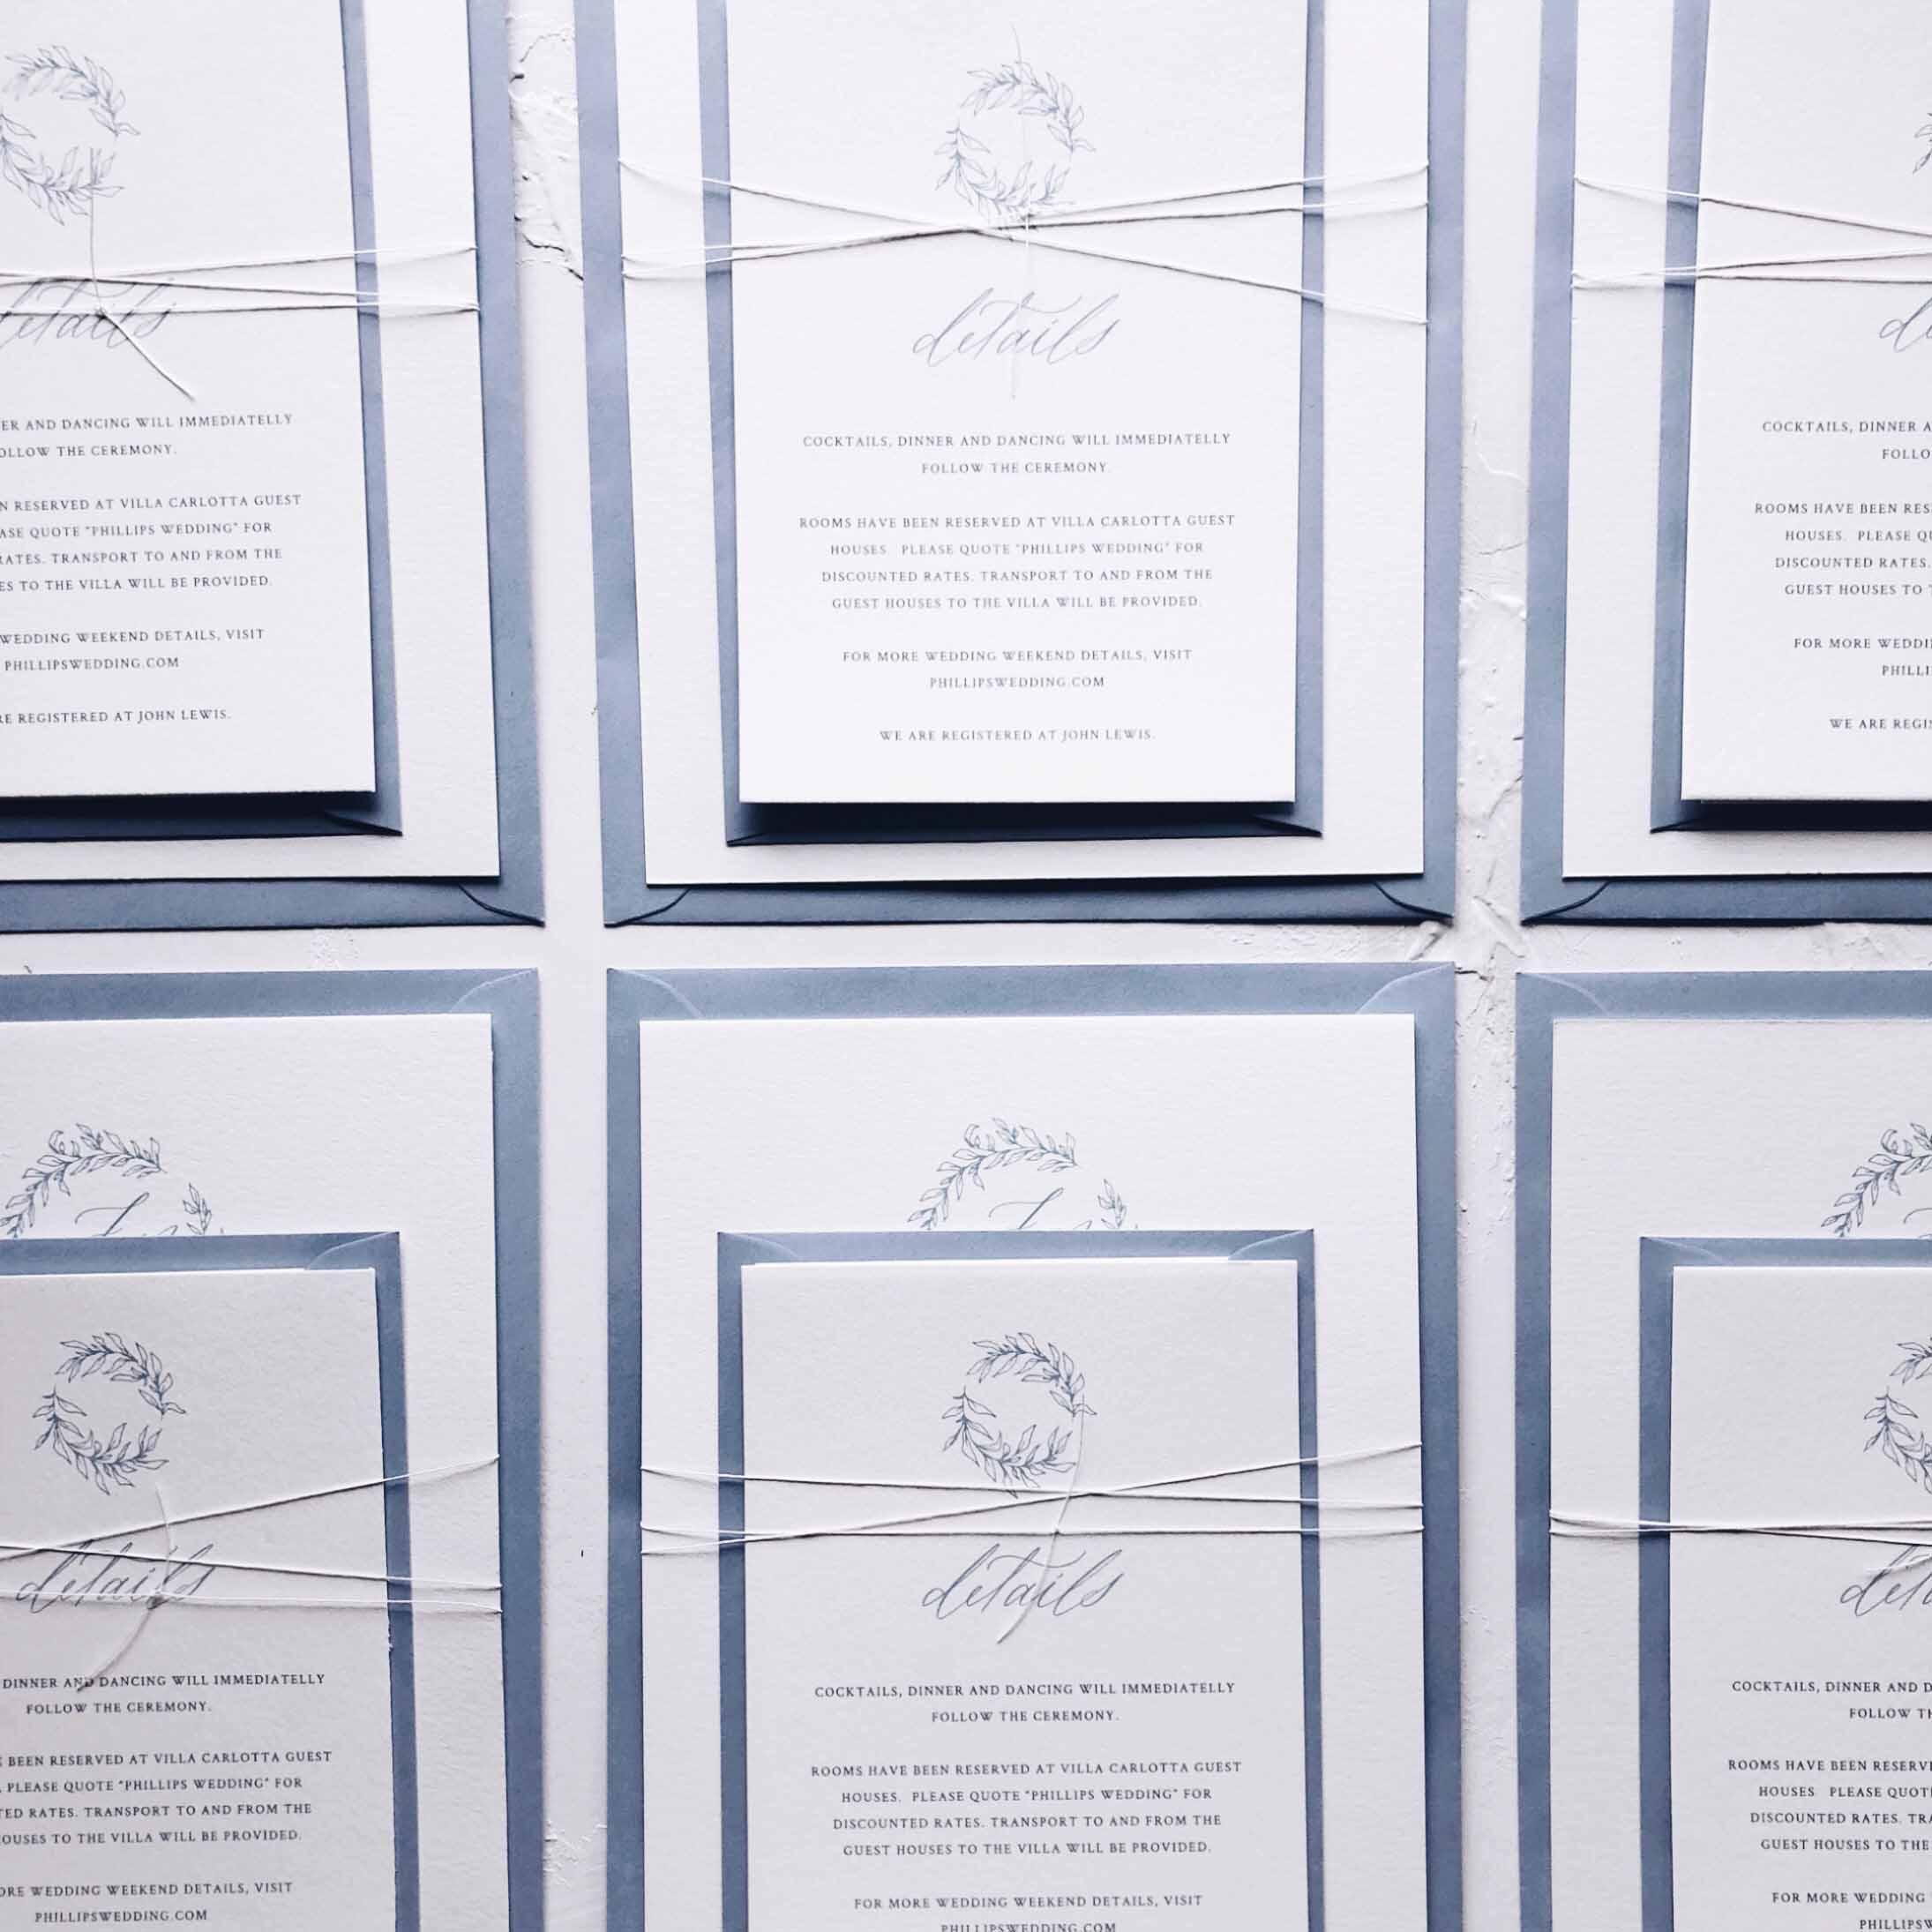 bespoke_wedding_invitations.JPG